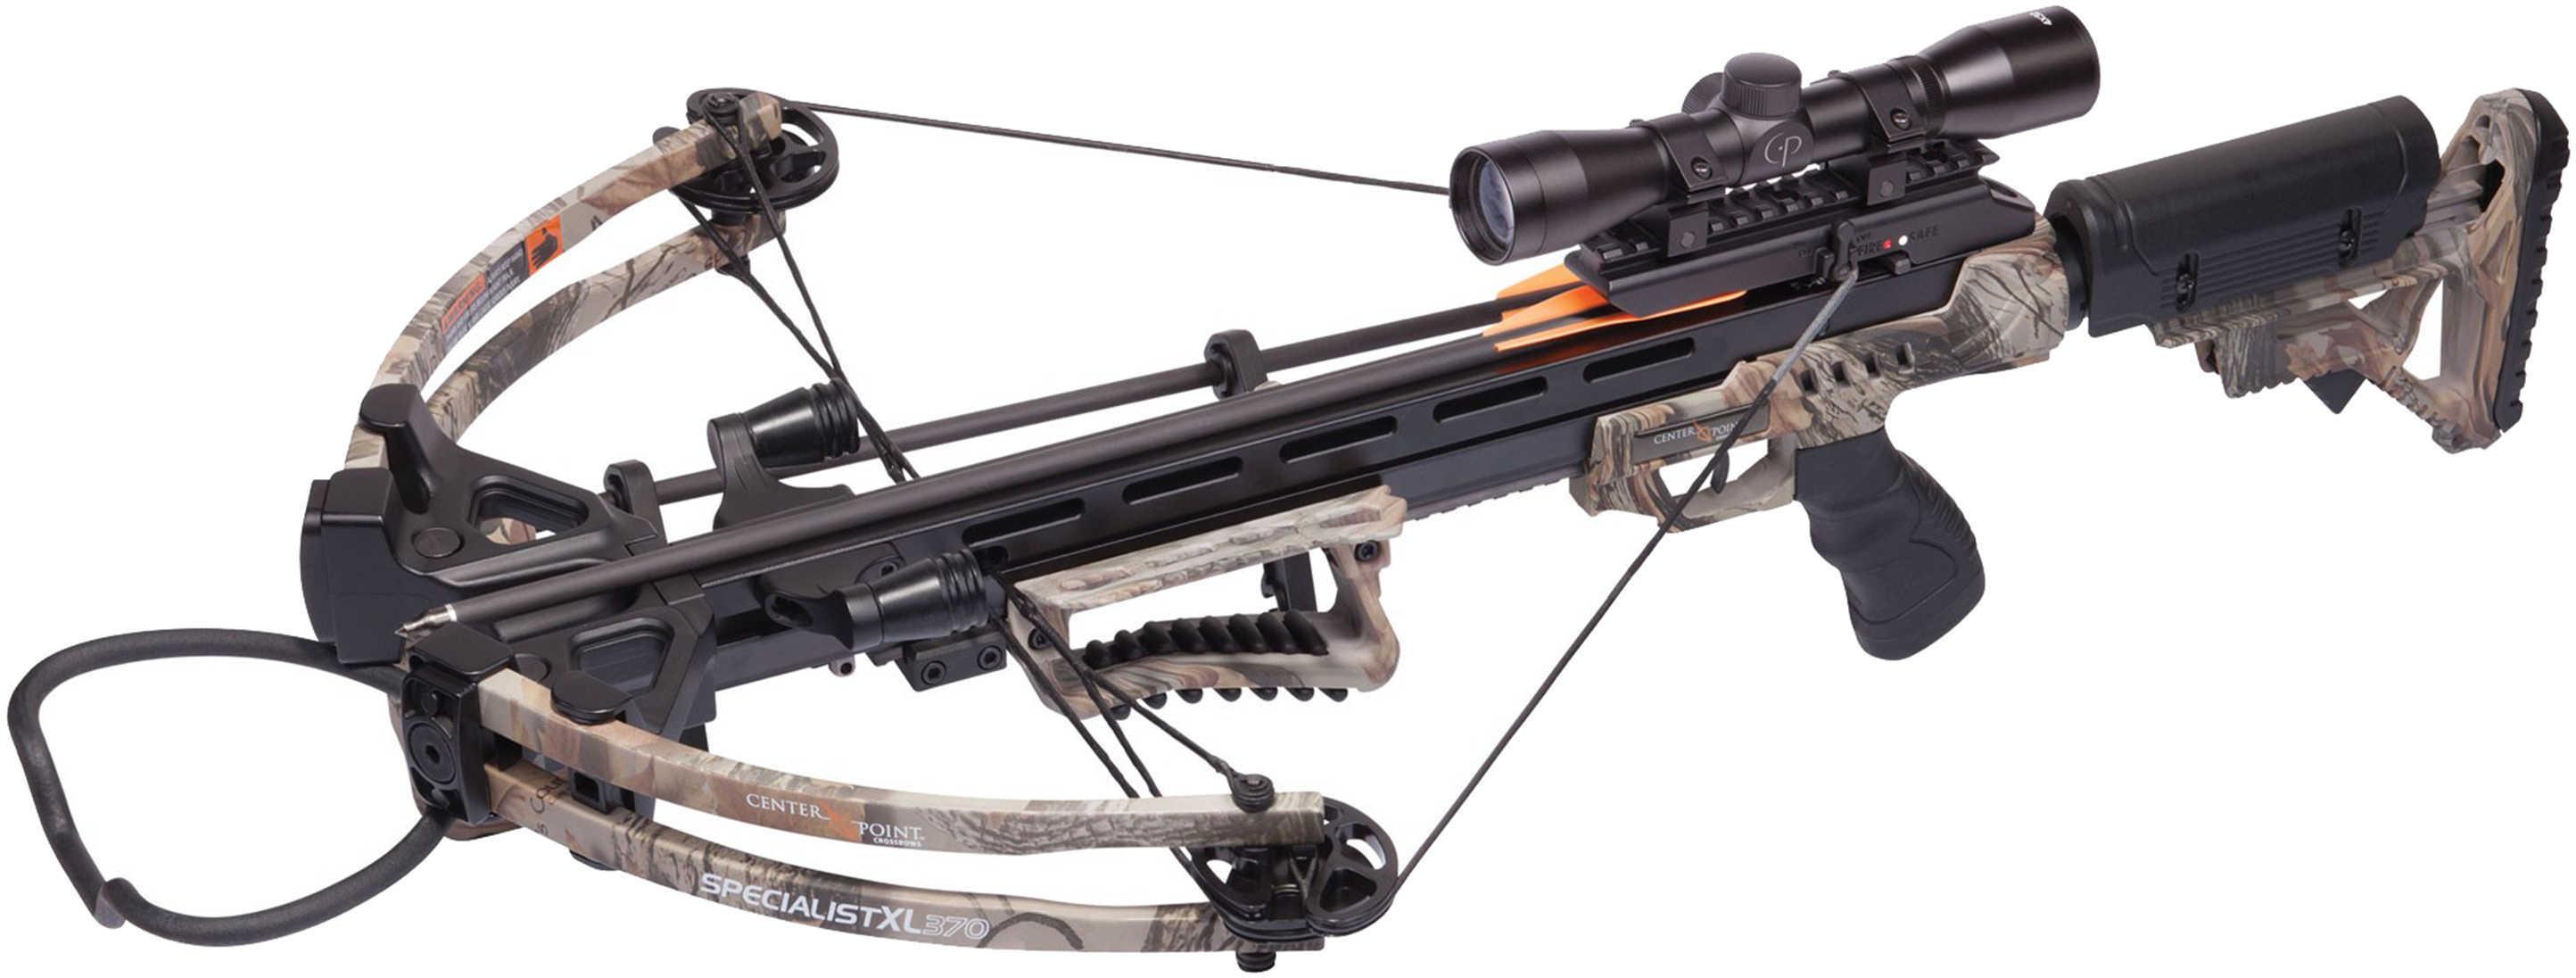 Crosman Specialist XL 370 Crossbow with 4x32mm Scope Md: AXCSP185CK